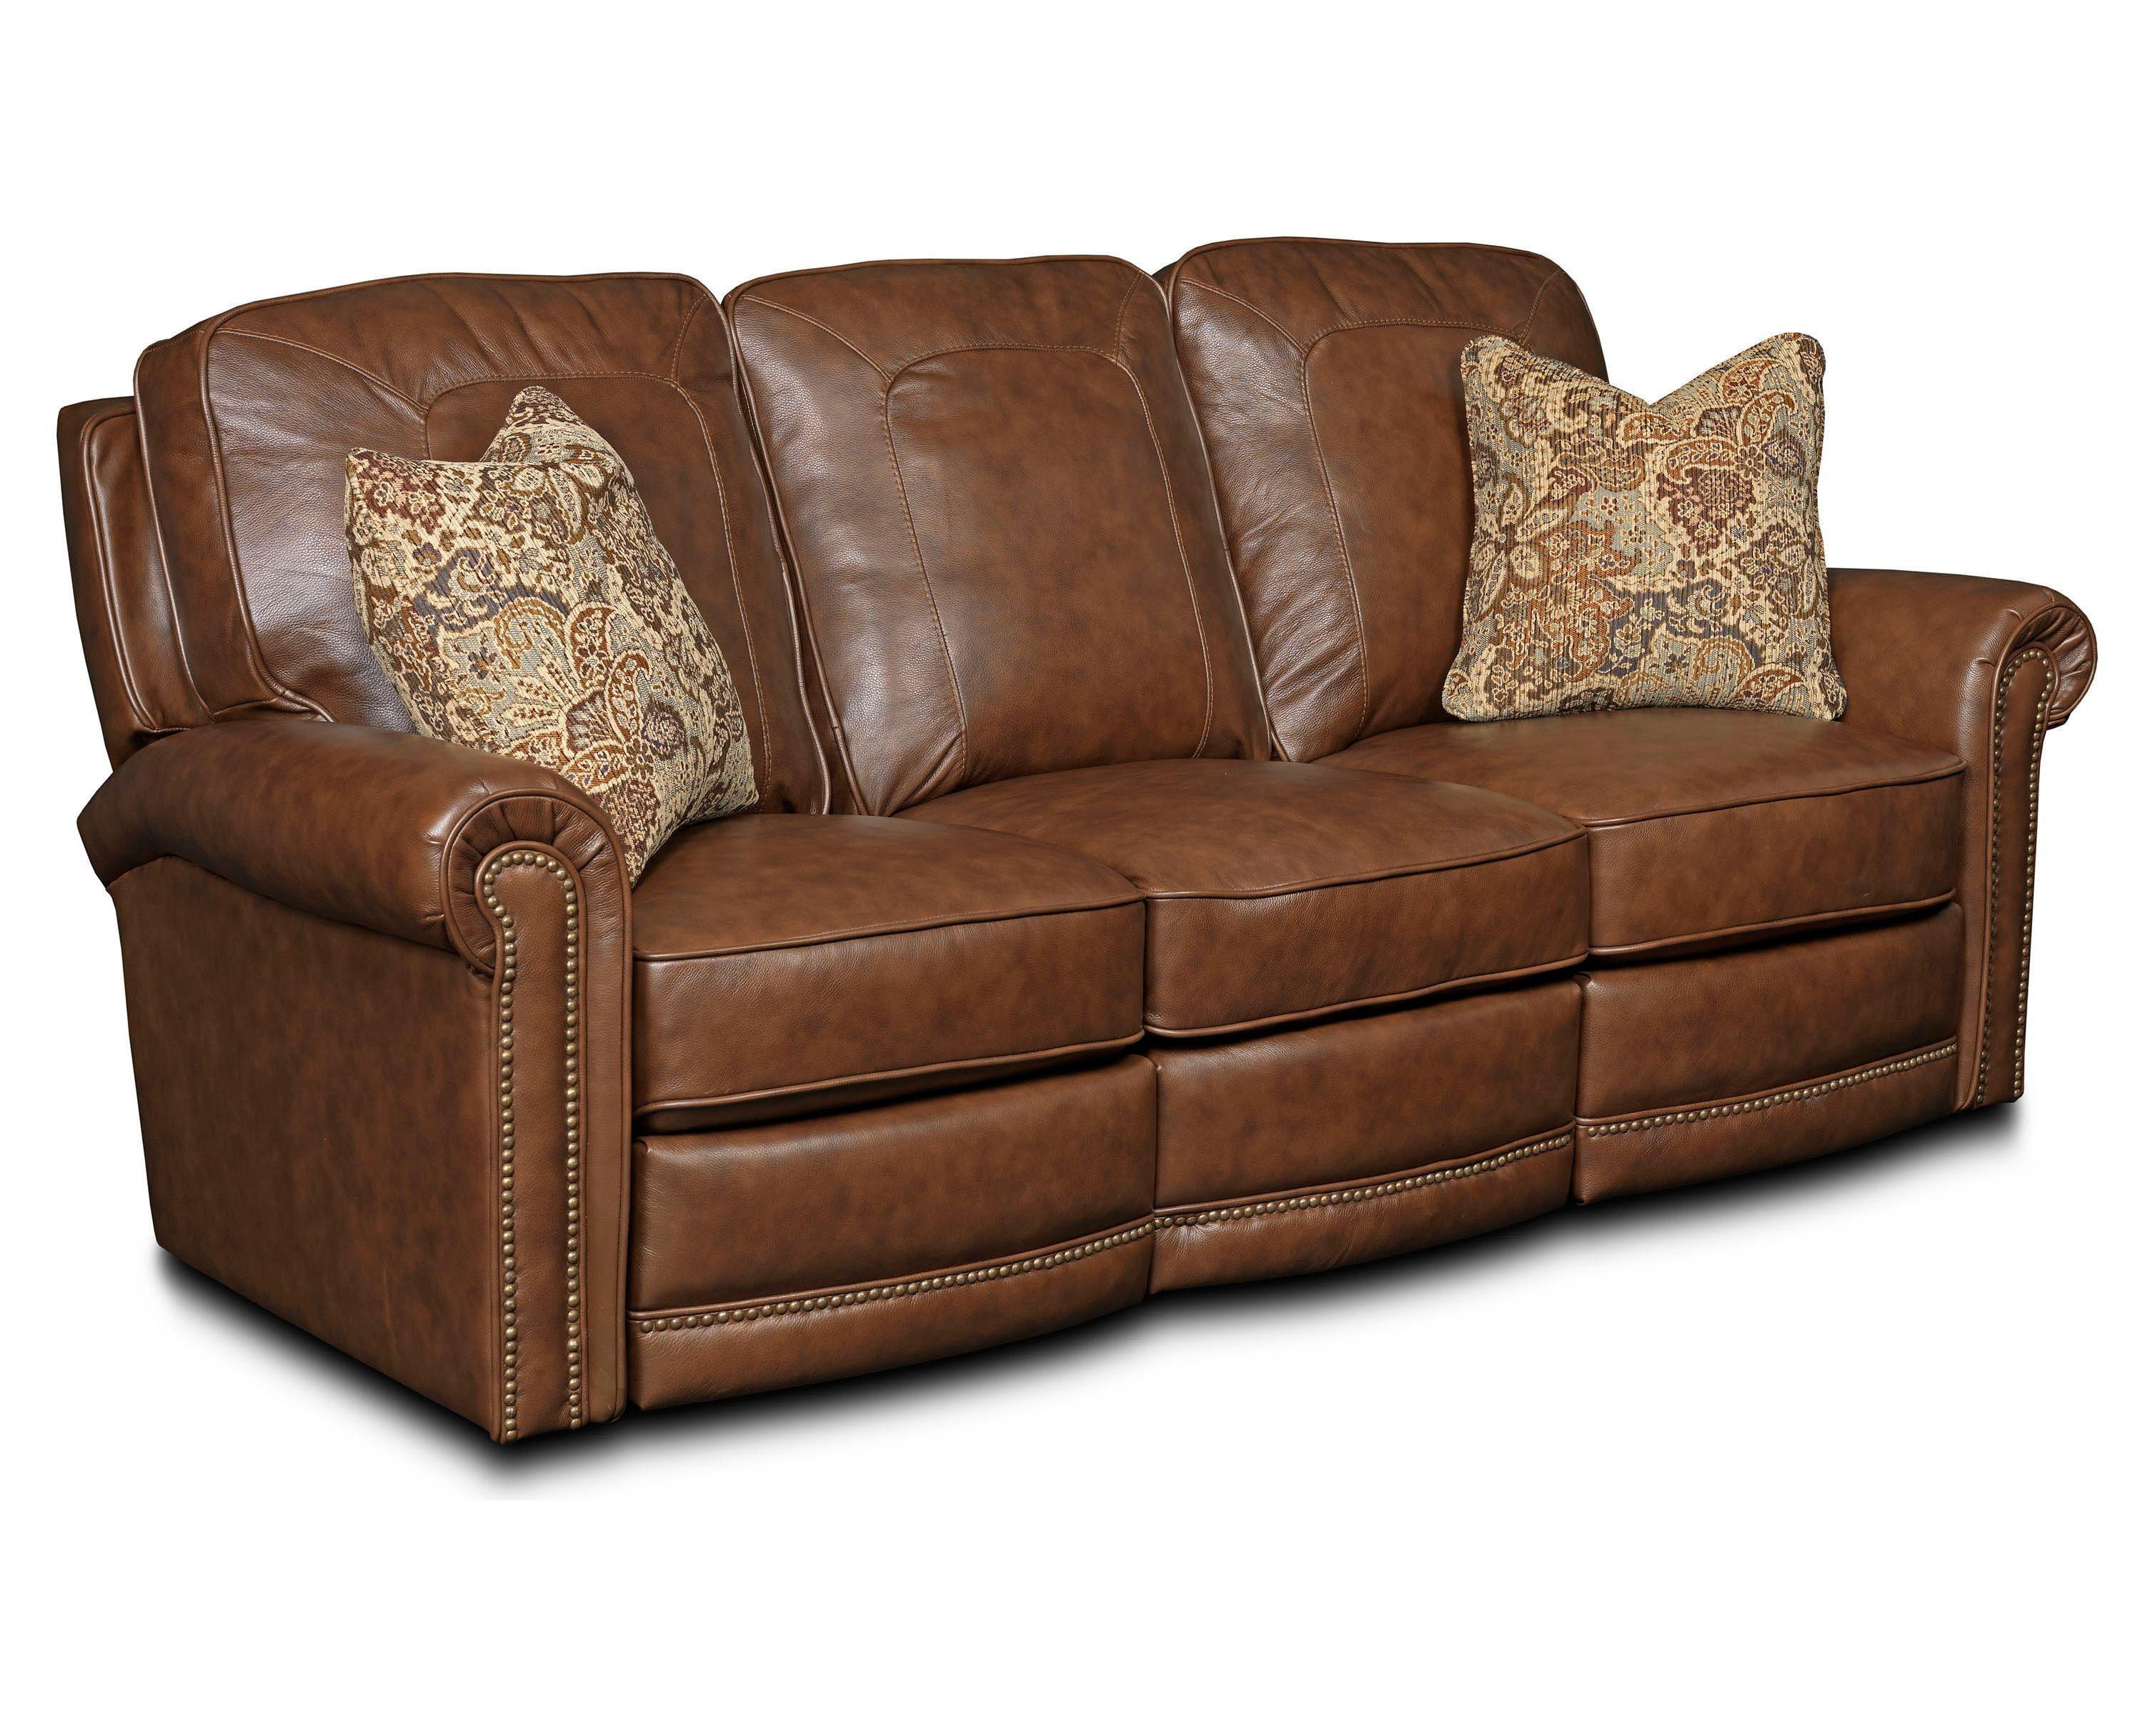 Jasmine LEATHER POWER Recliner Sofa RecliningSofa